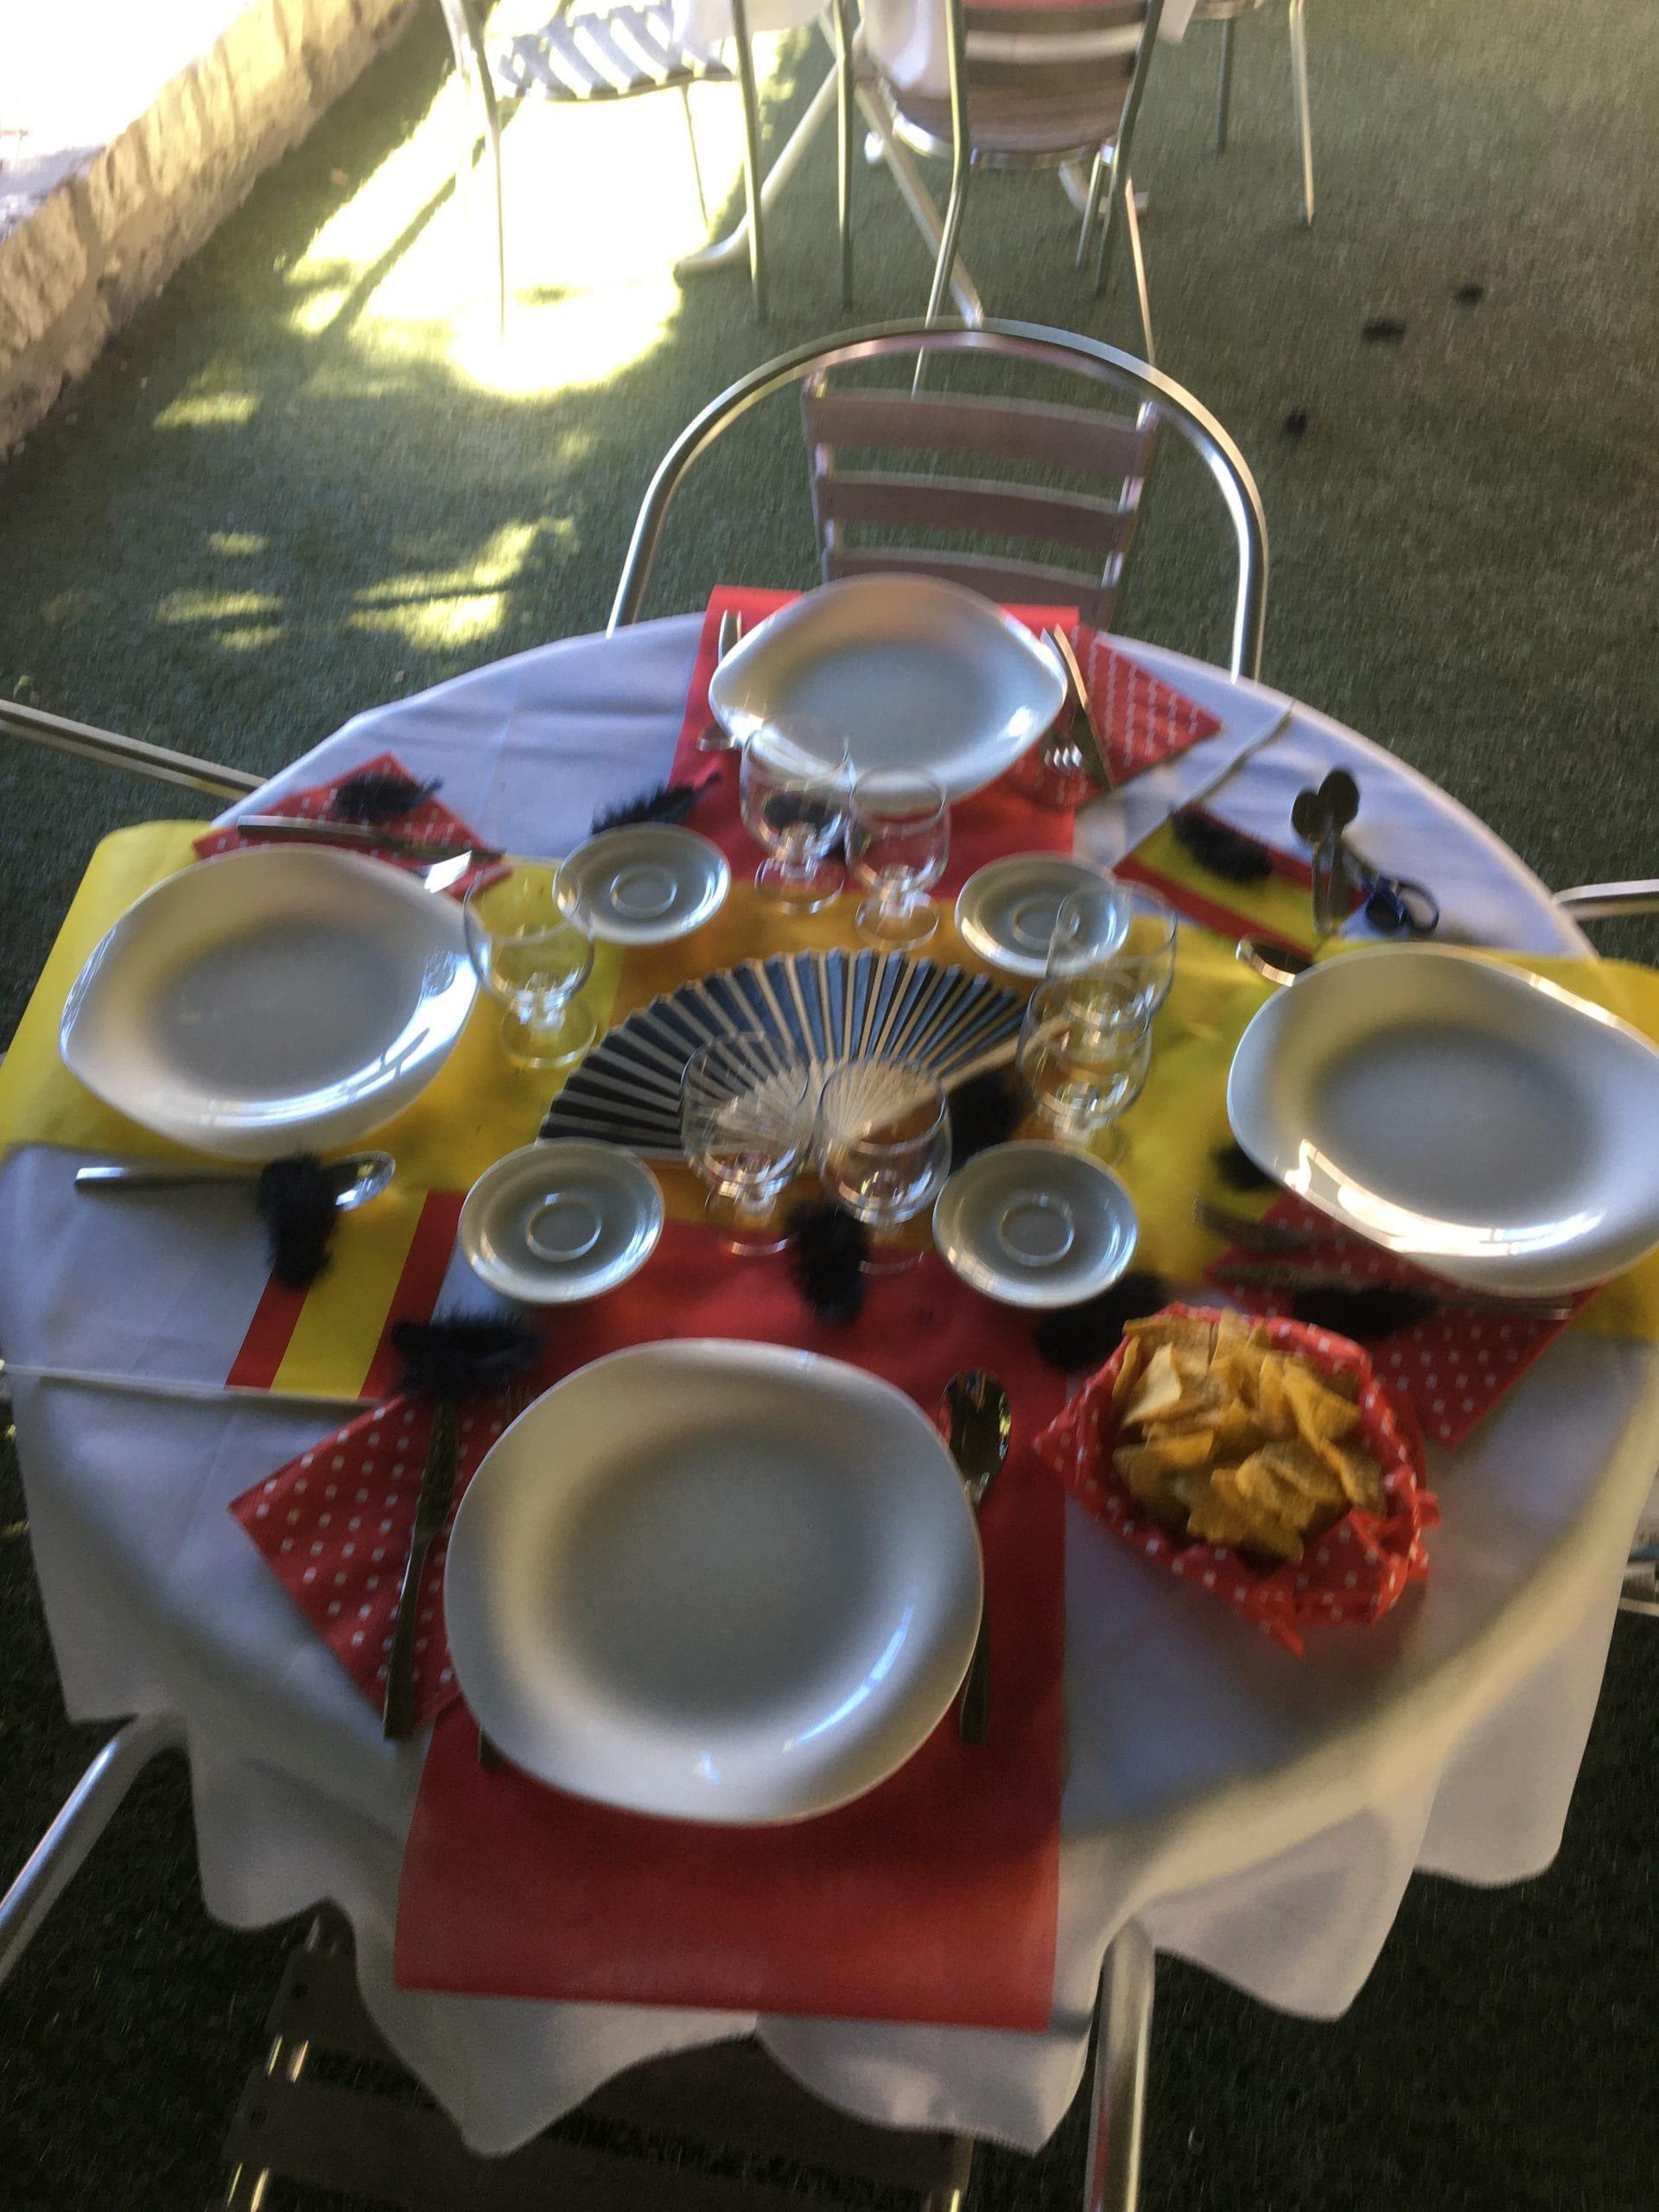 Repas espagnol en maison de retraite.